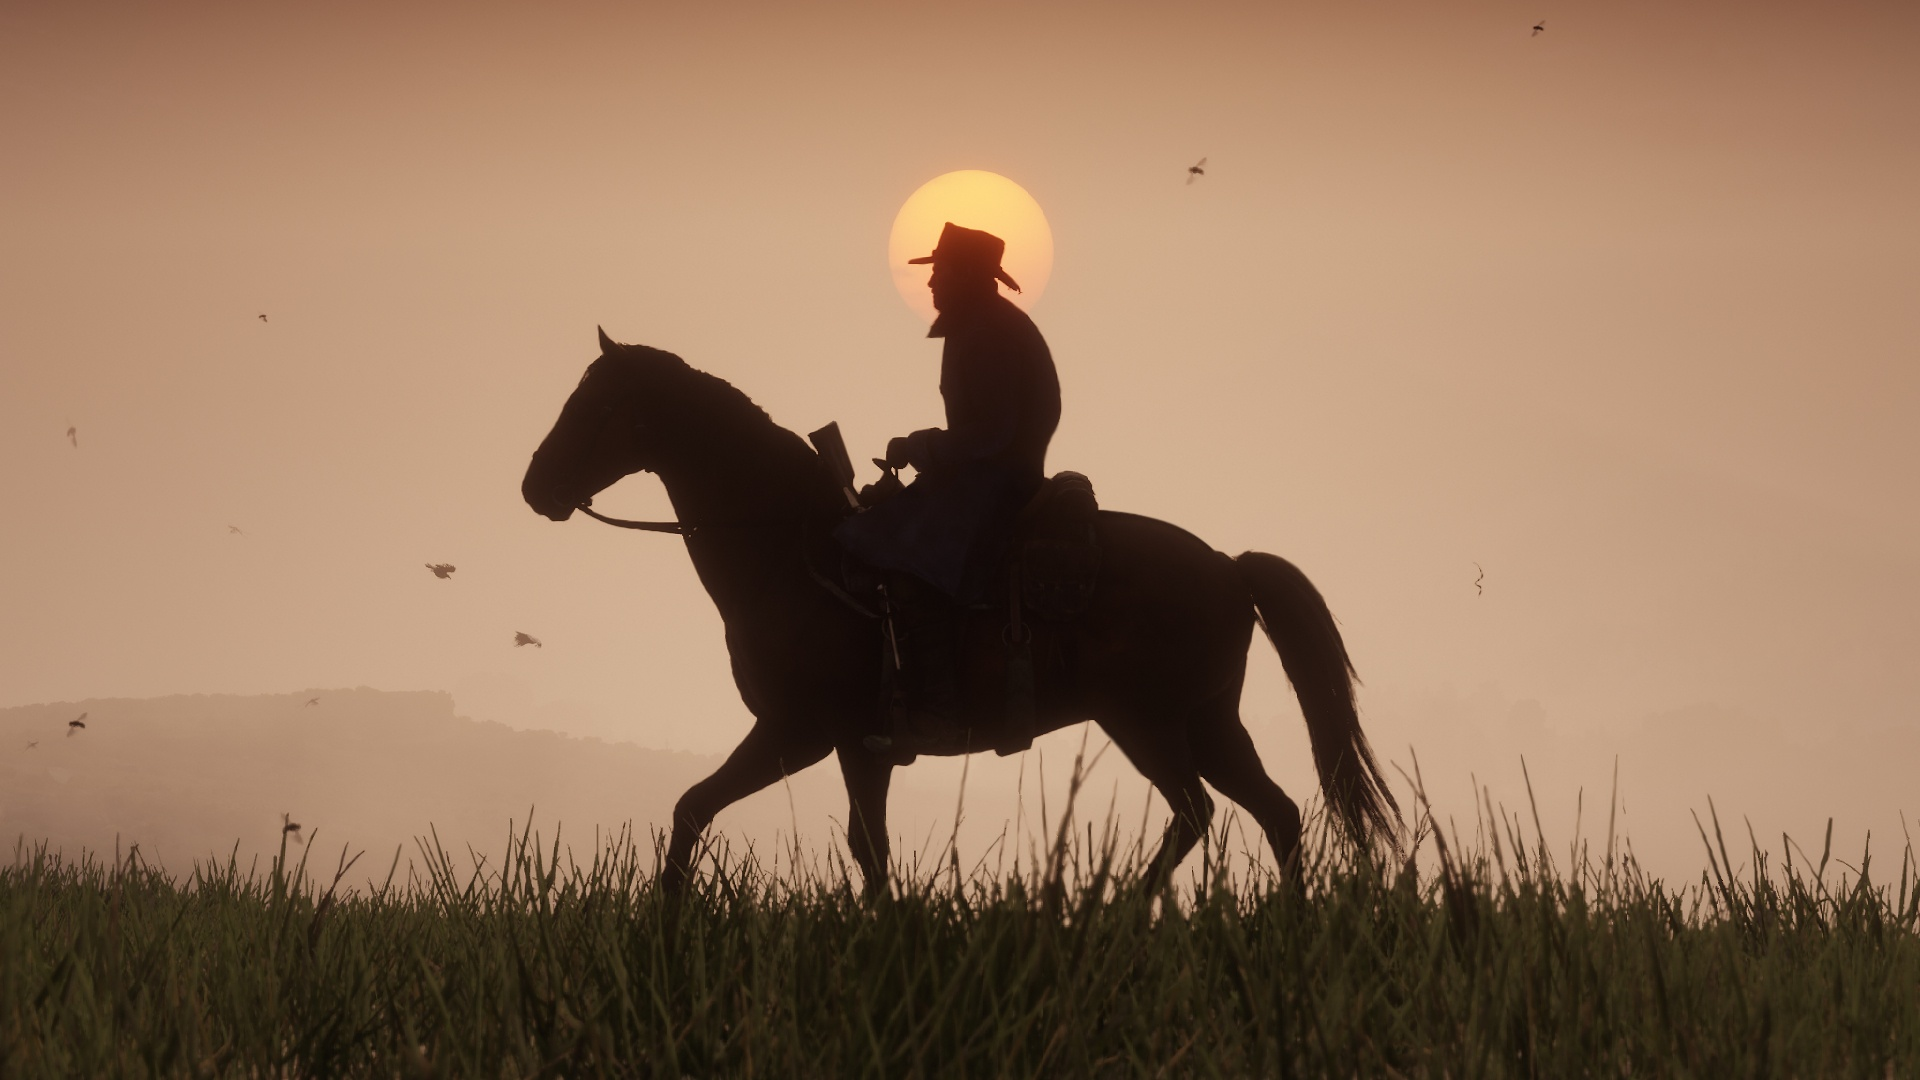 Rockstar Red Dead Redemption 2 horse bonding